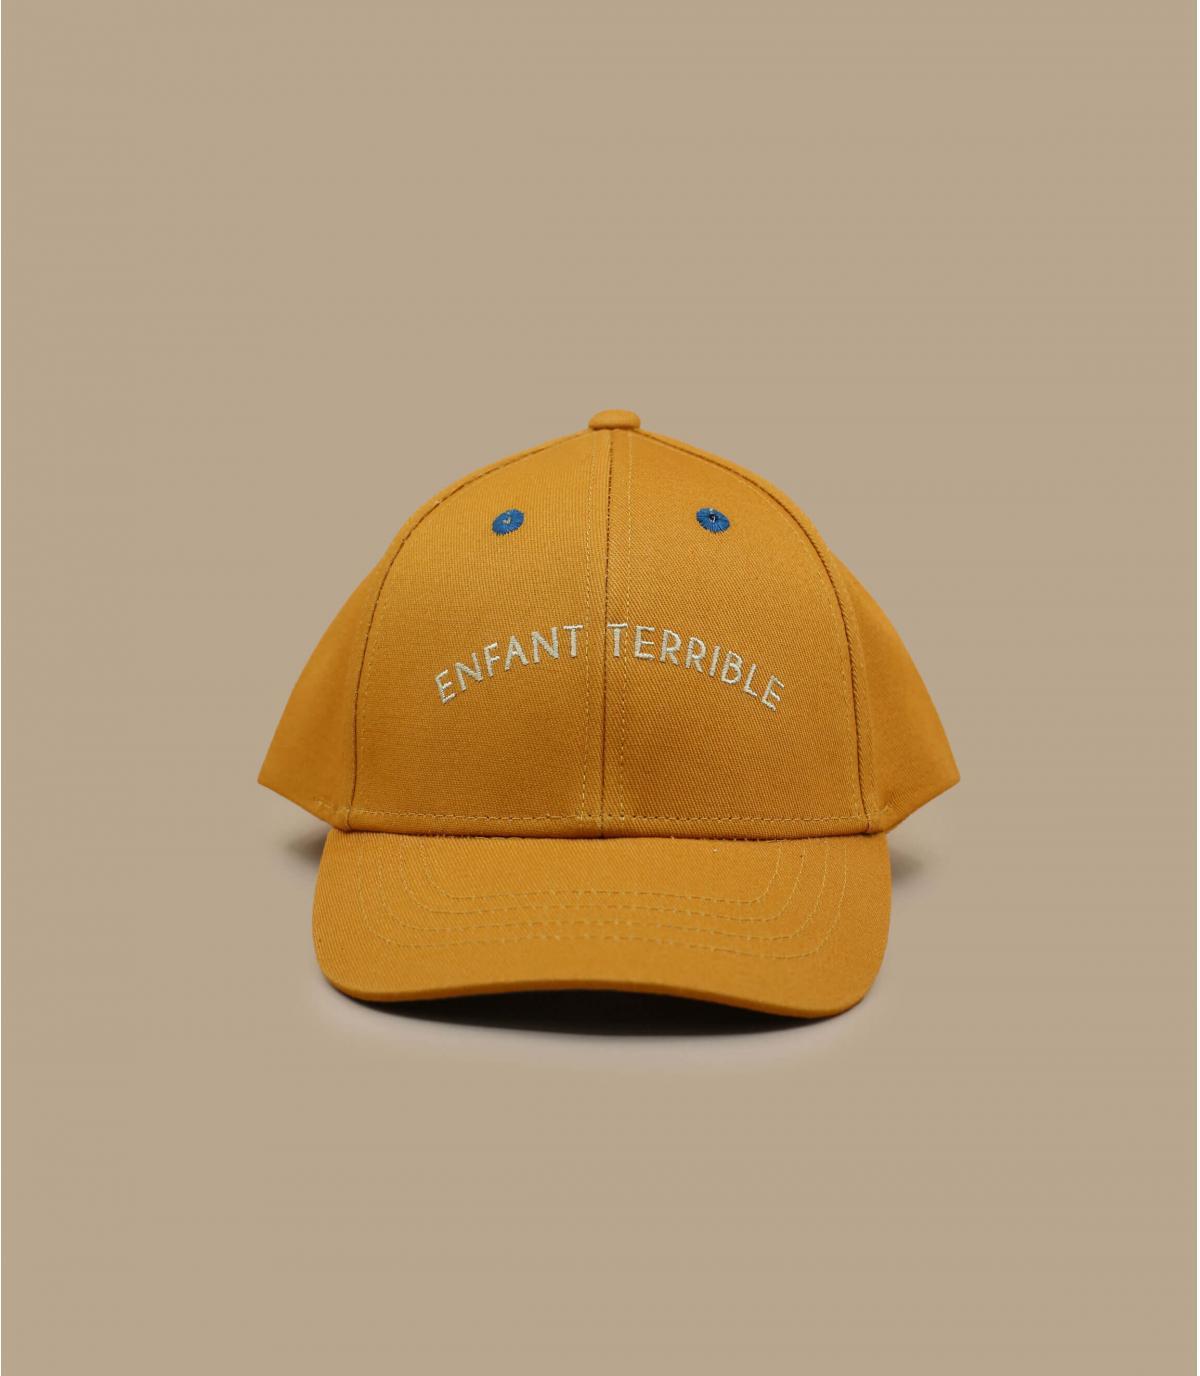 casquette Enfant Terrible jaune